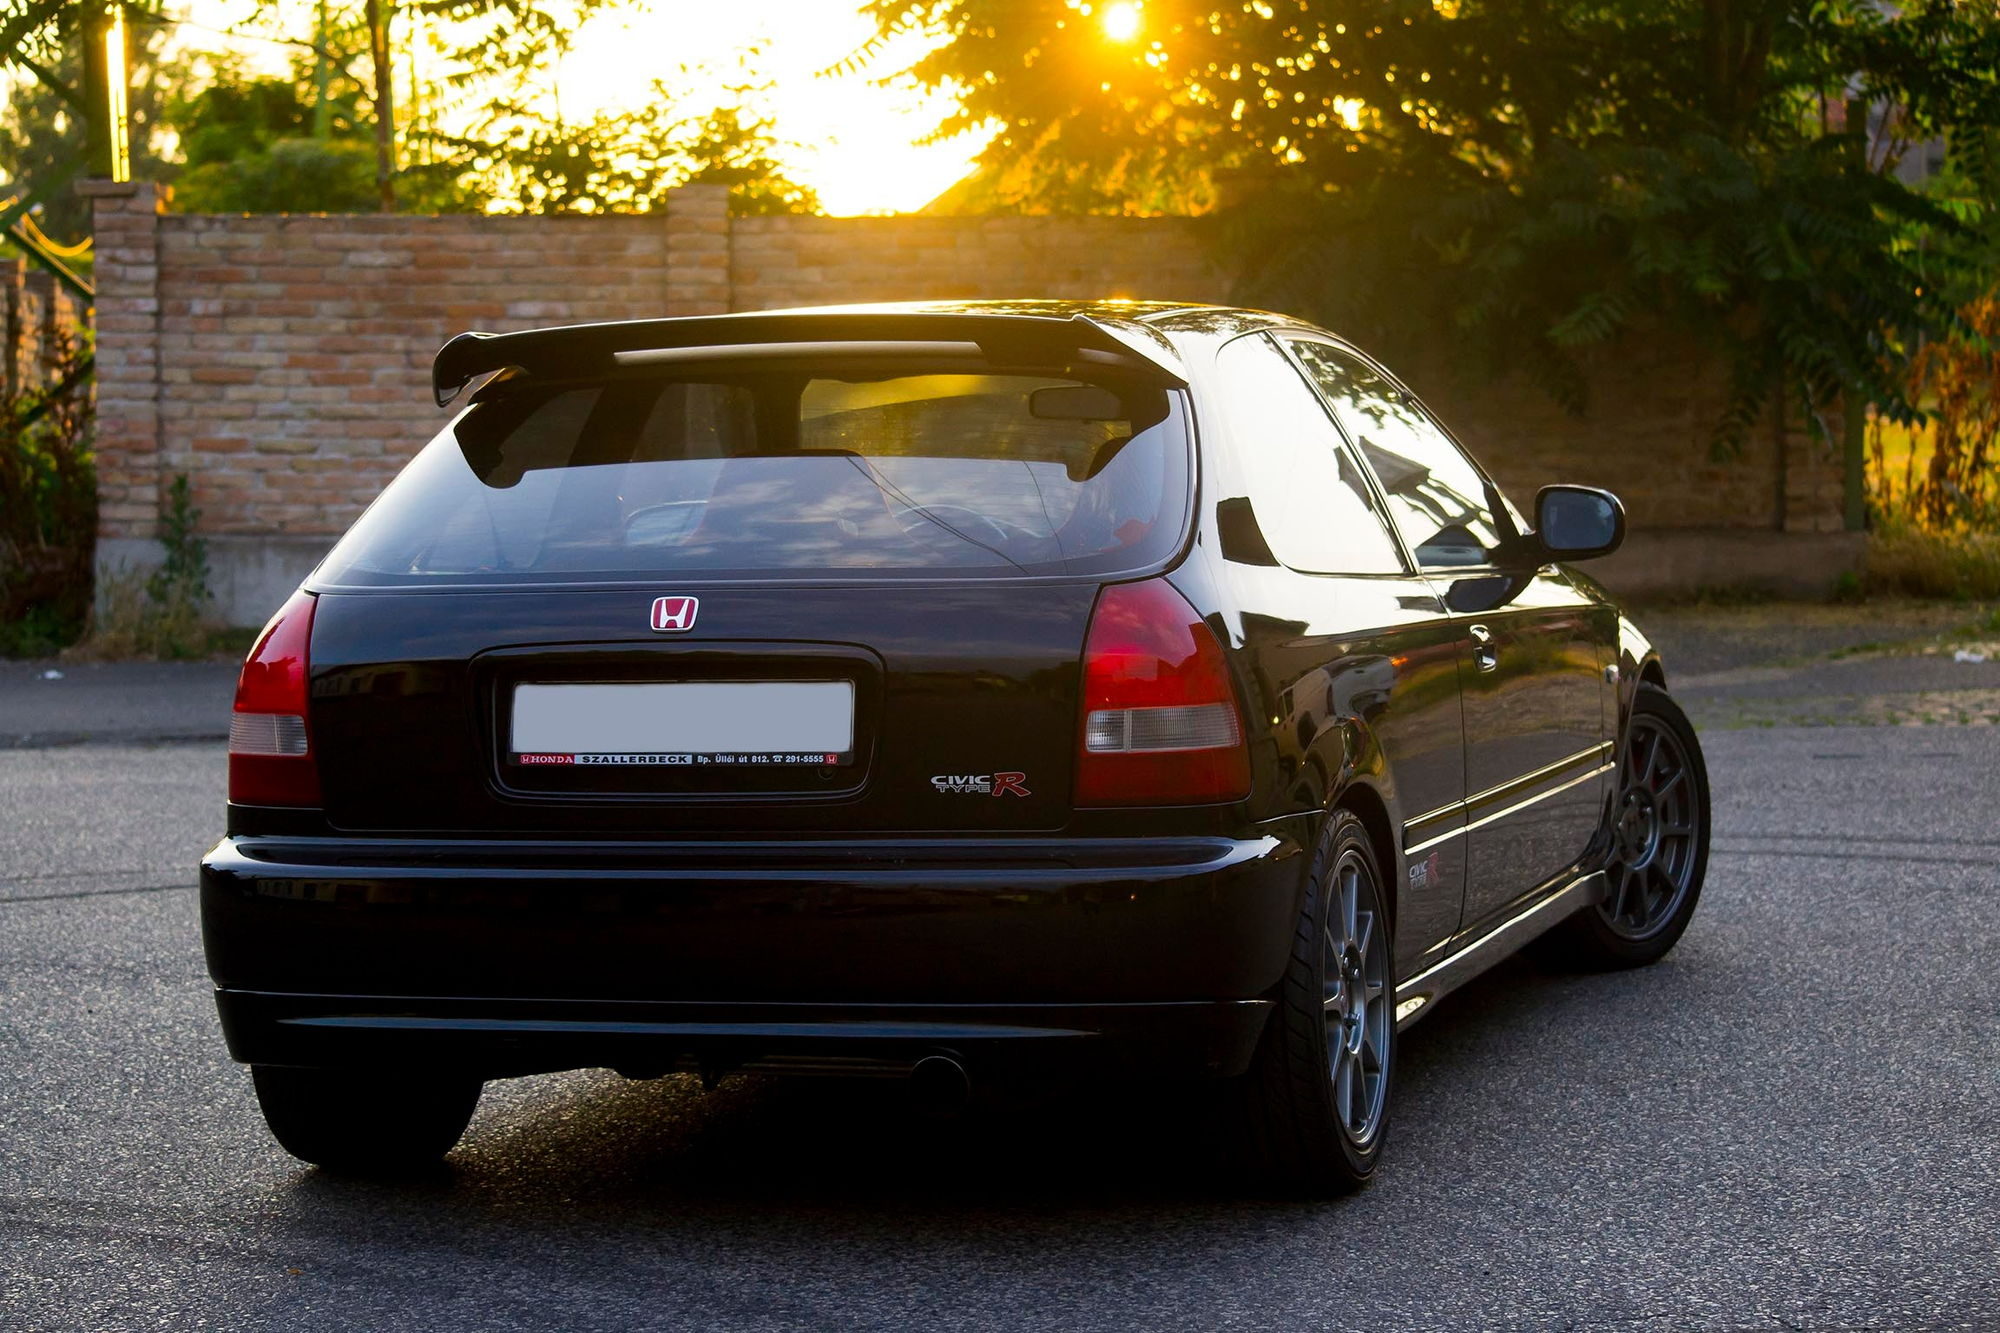 International lhd ek9 conversion with b18c engine 39 99 for Honda civic 99 for sale